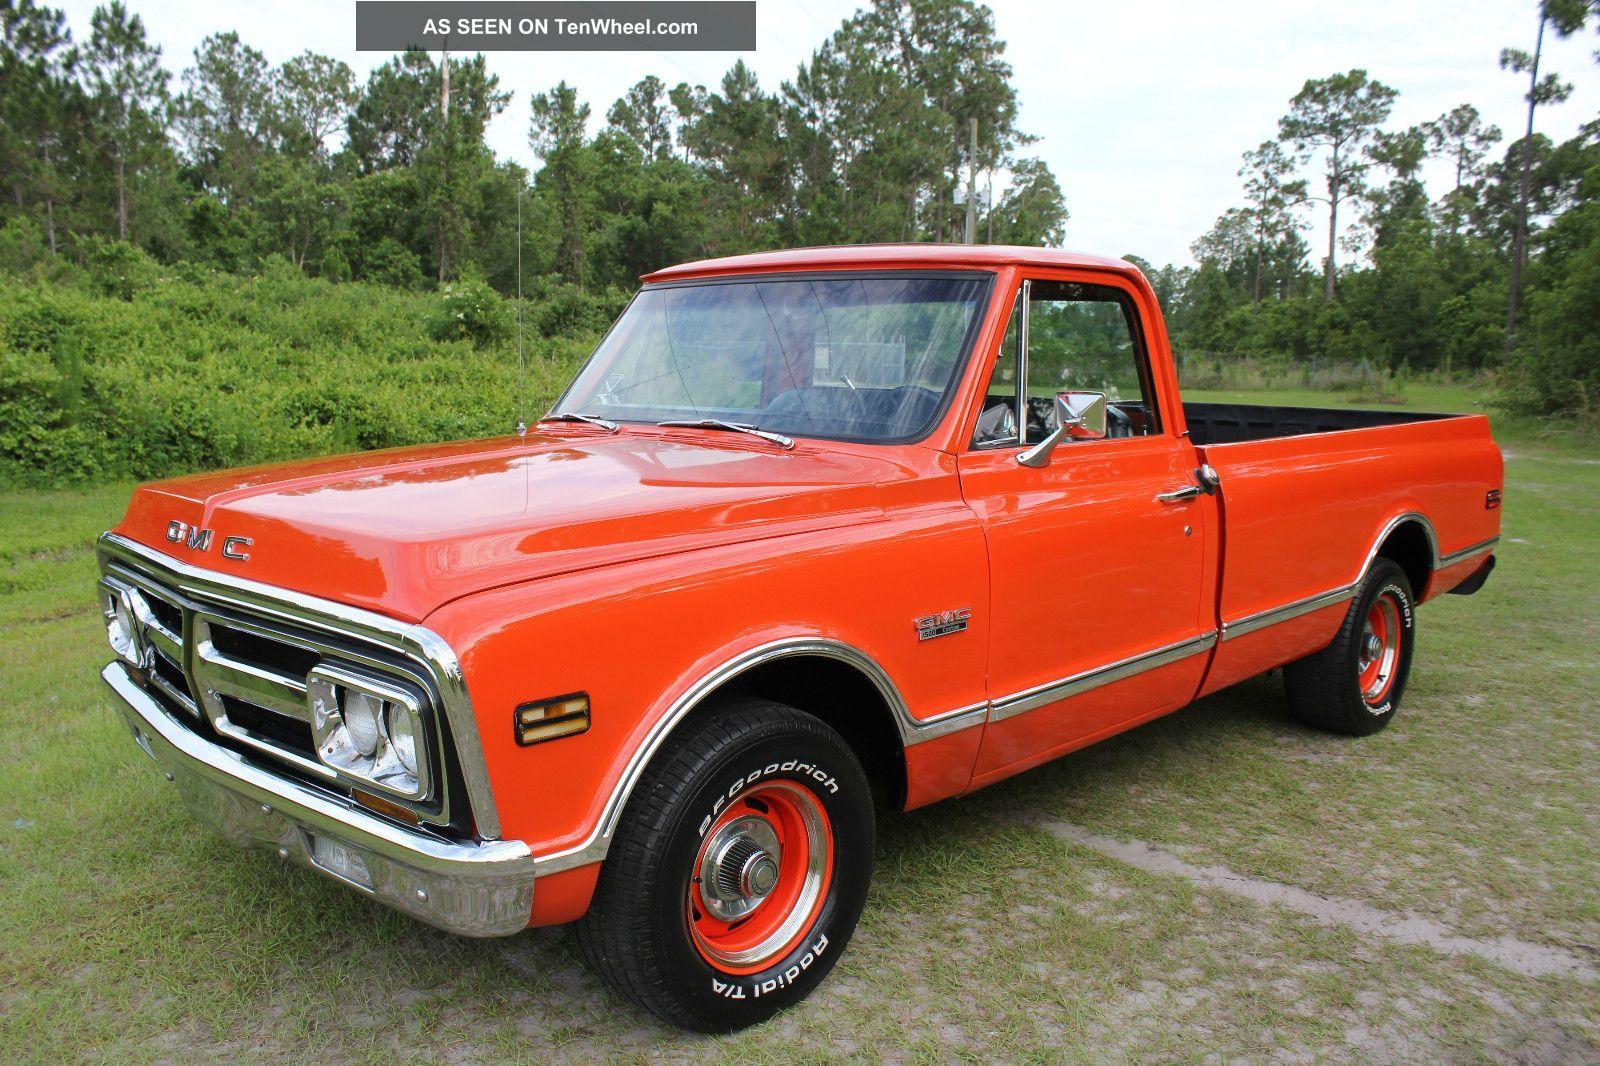 16001066 Donnie R 1066 International Wiring Diagram 1971 Gmc 1500 Custom Pickup Truck General Motors Make Me An Offer 1 Lgw